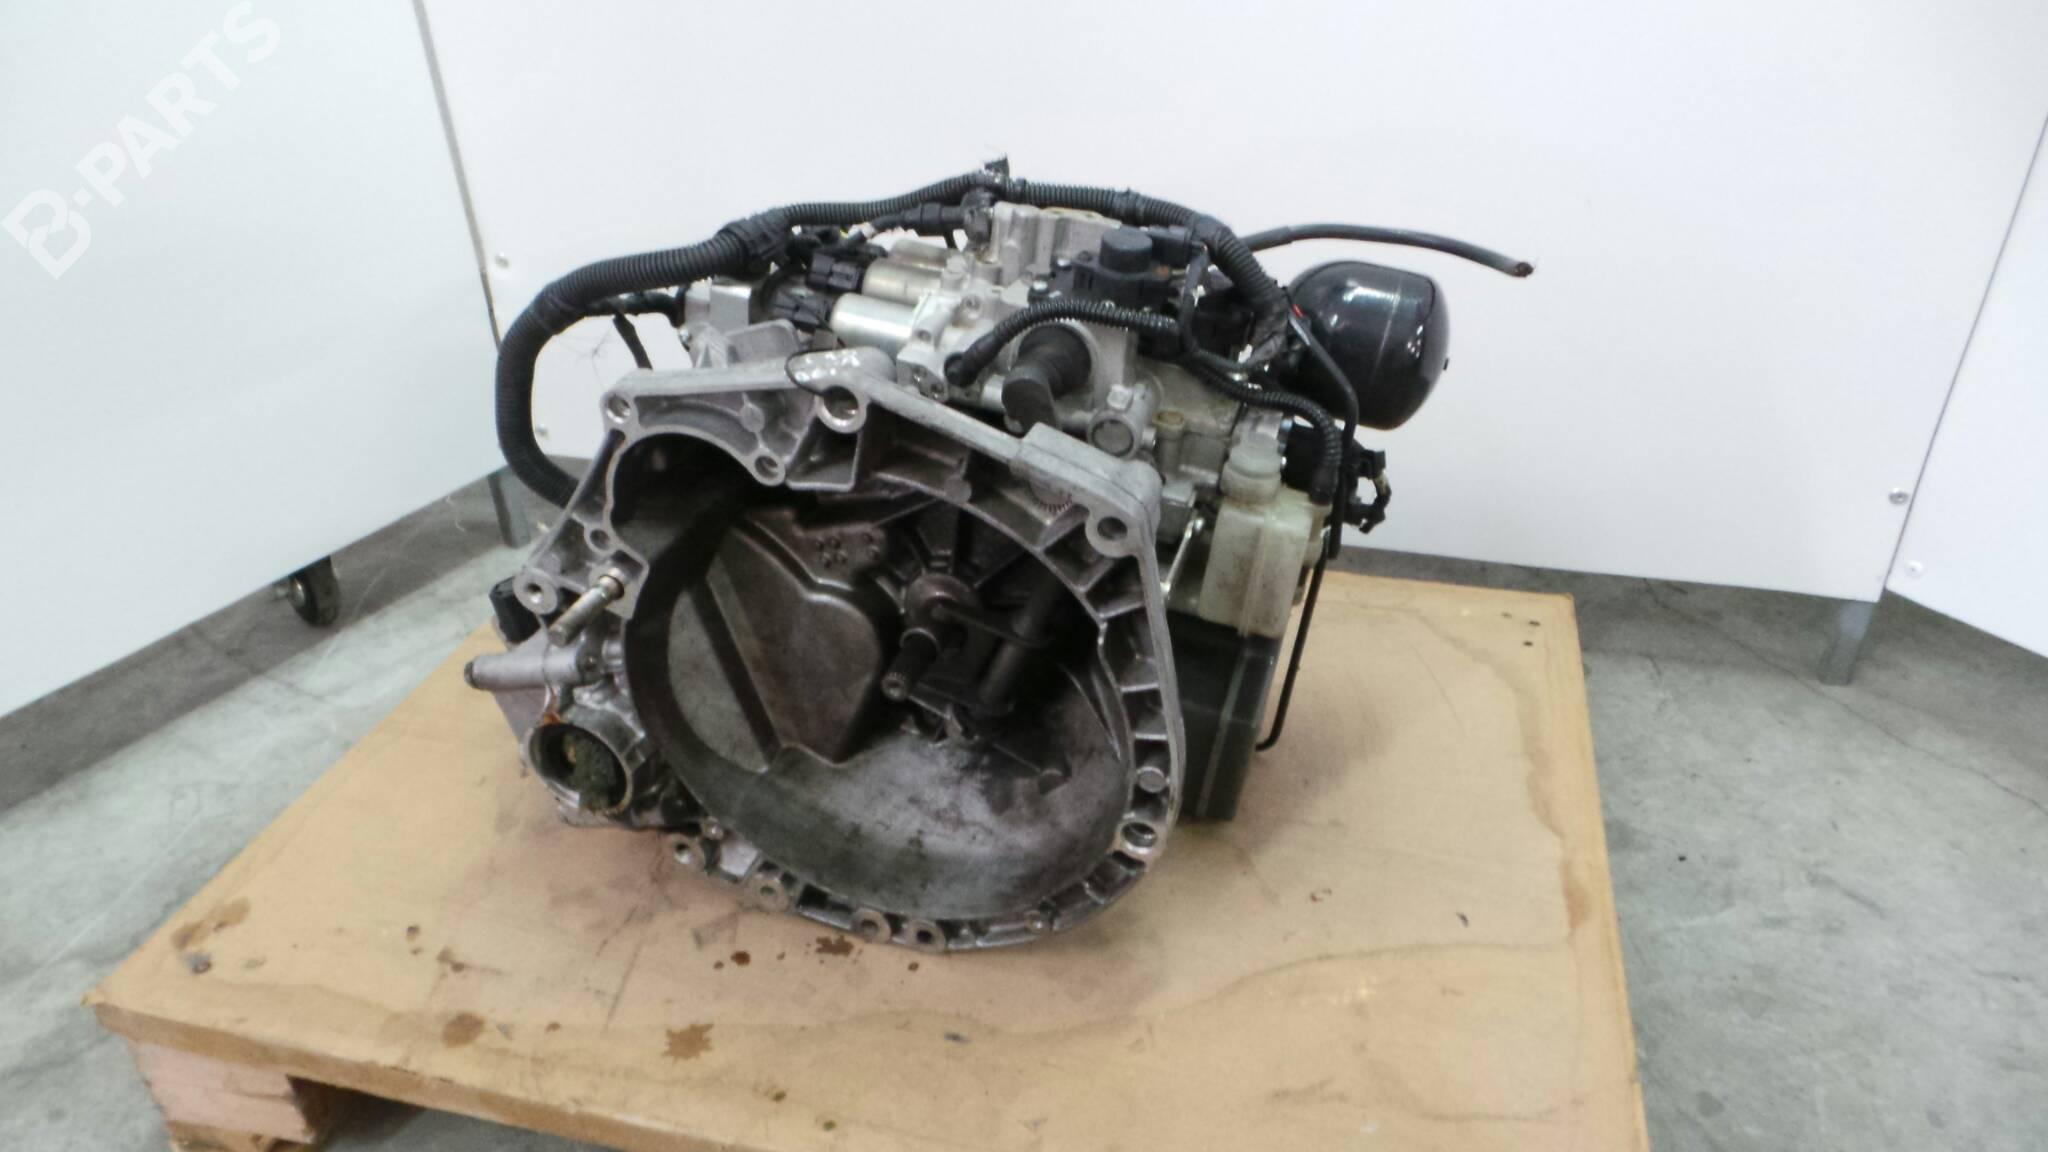 Automatic Gearbox Fiat Idea 350 14 16v 10544 Fuse Box 95hp 843 A1